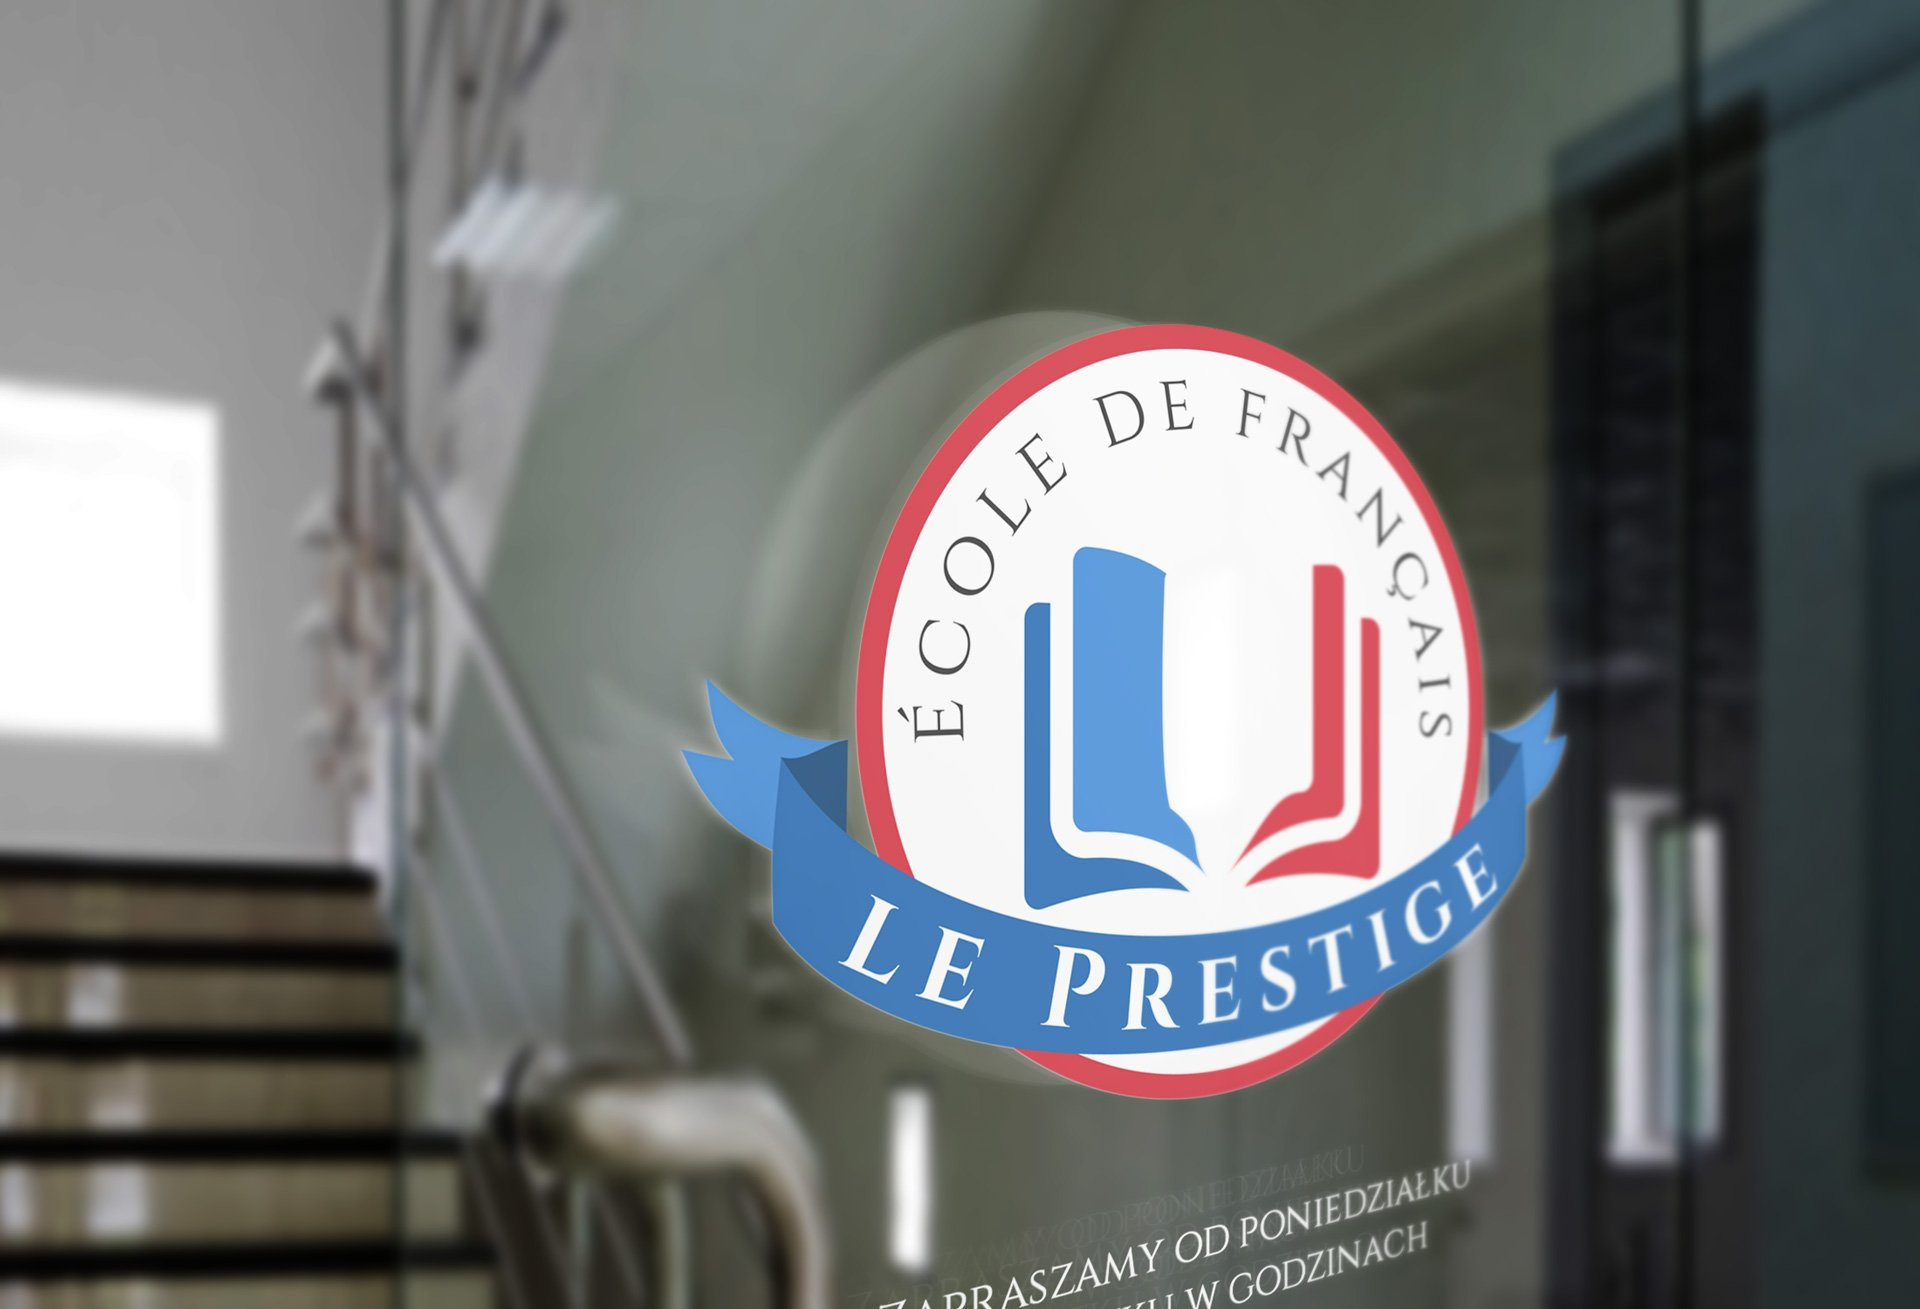 Logo Le Prestige na szkle (by BBIG.PL)